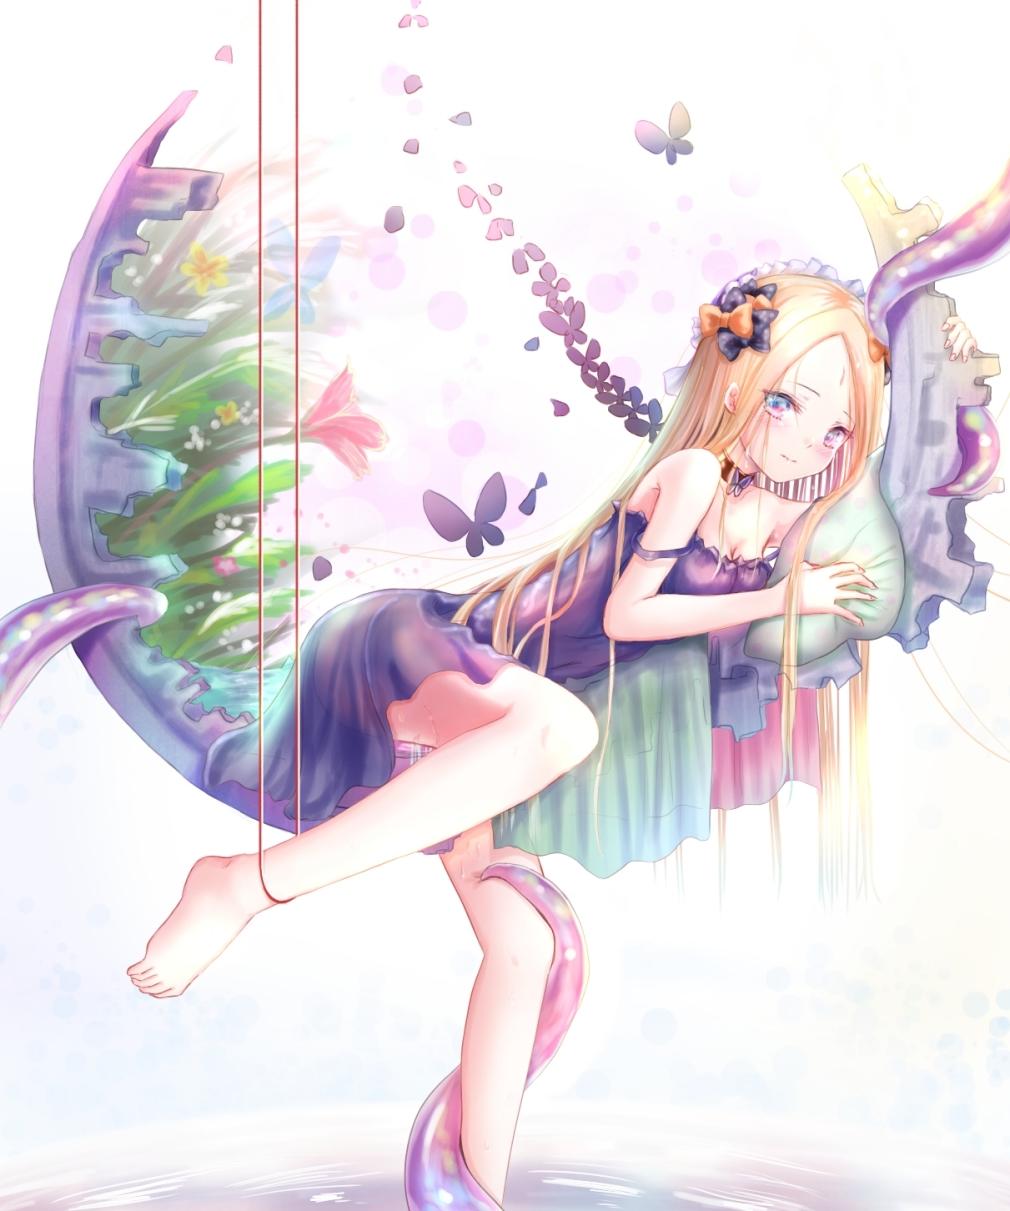 【FGO】Summer Abigail Williams NPC Demo【Fate/Grand Order